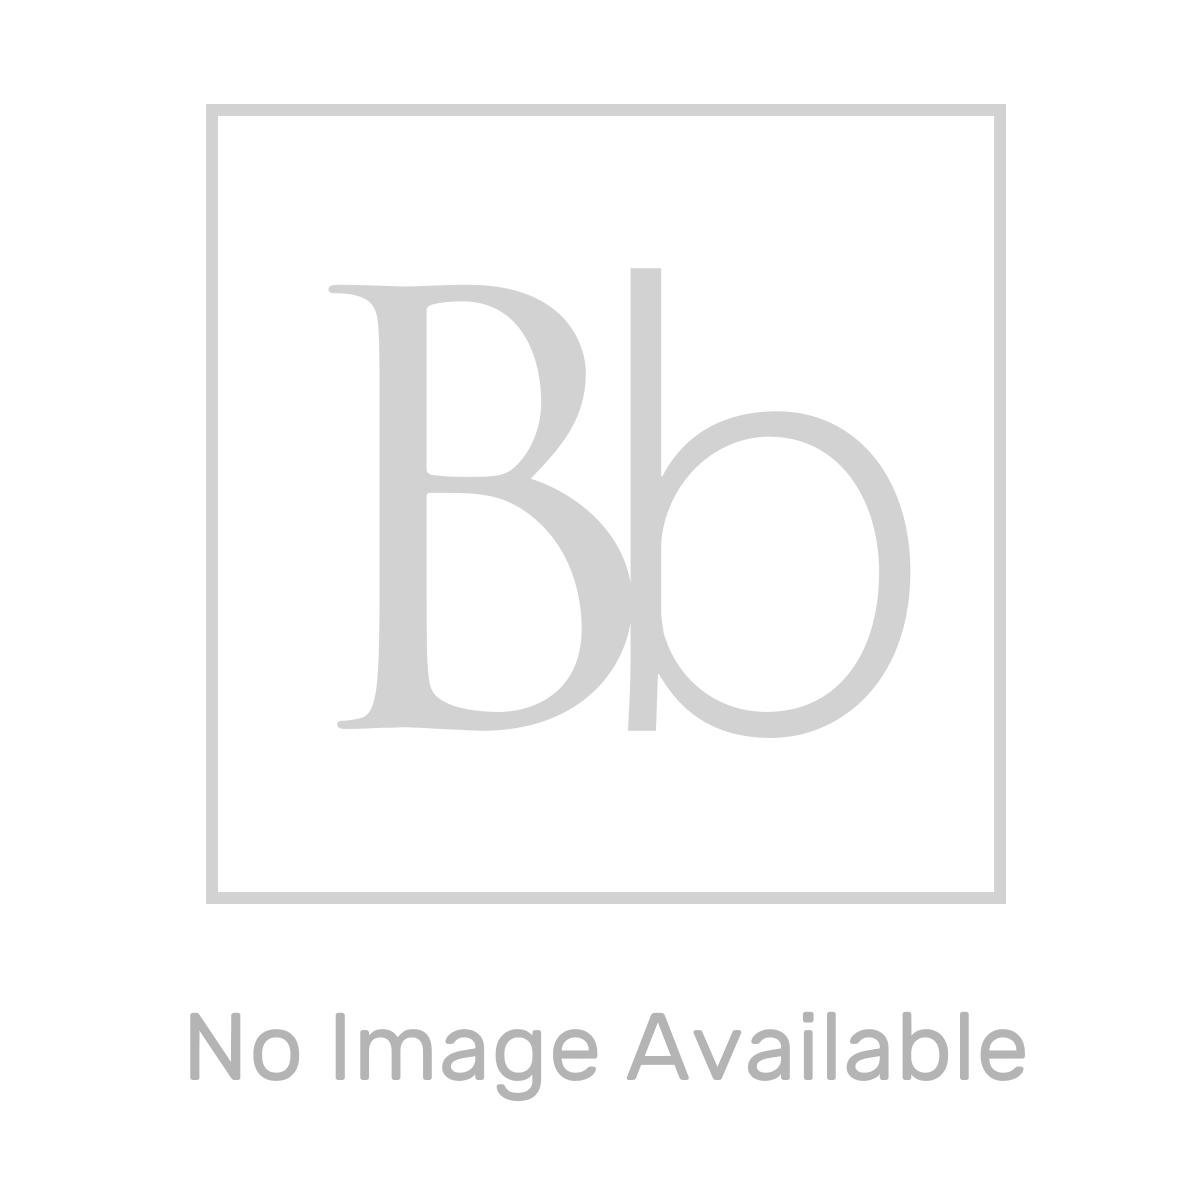 RAK Compact Comfort Height Flush To Wall Toilet Measurements